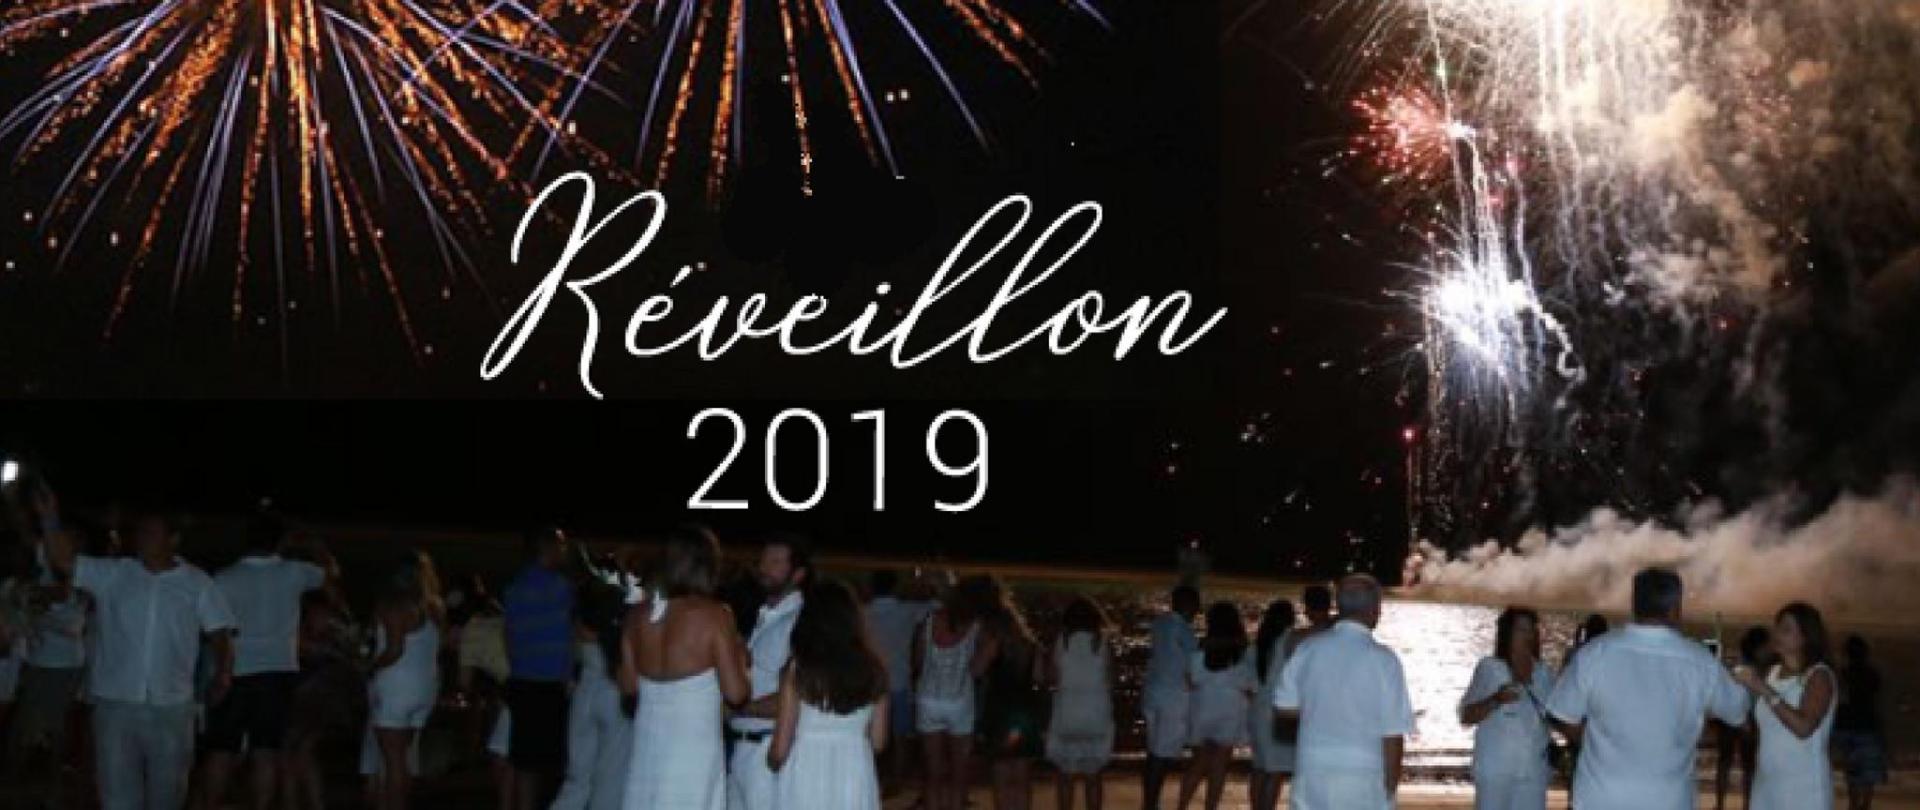 serrambi-resort-reveillon-2019 (1).png